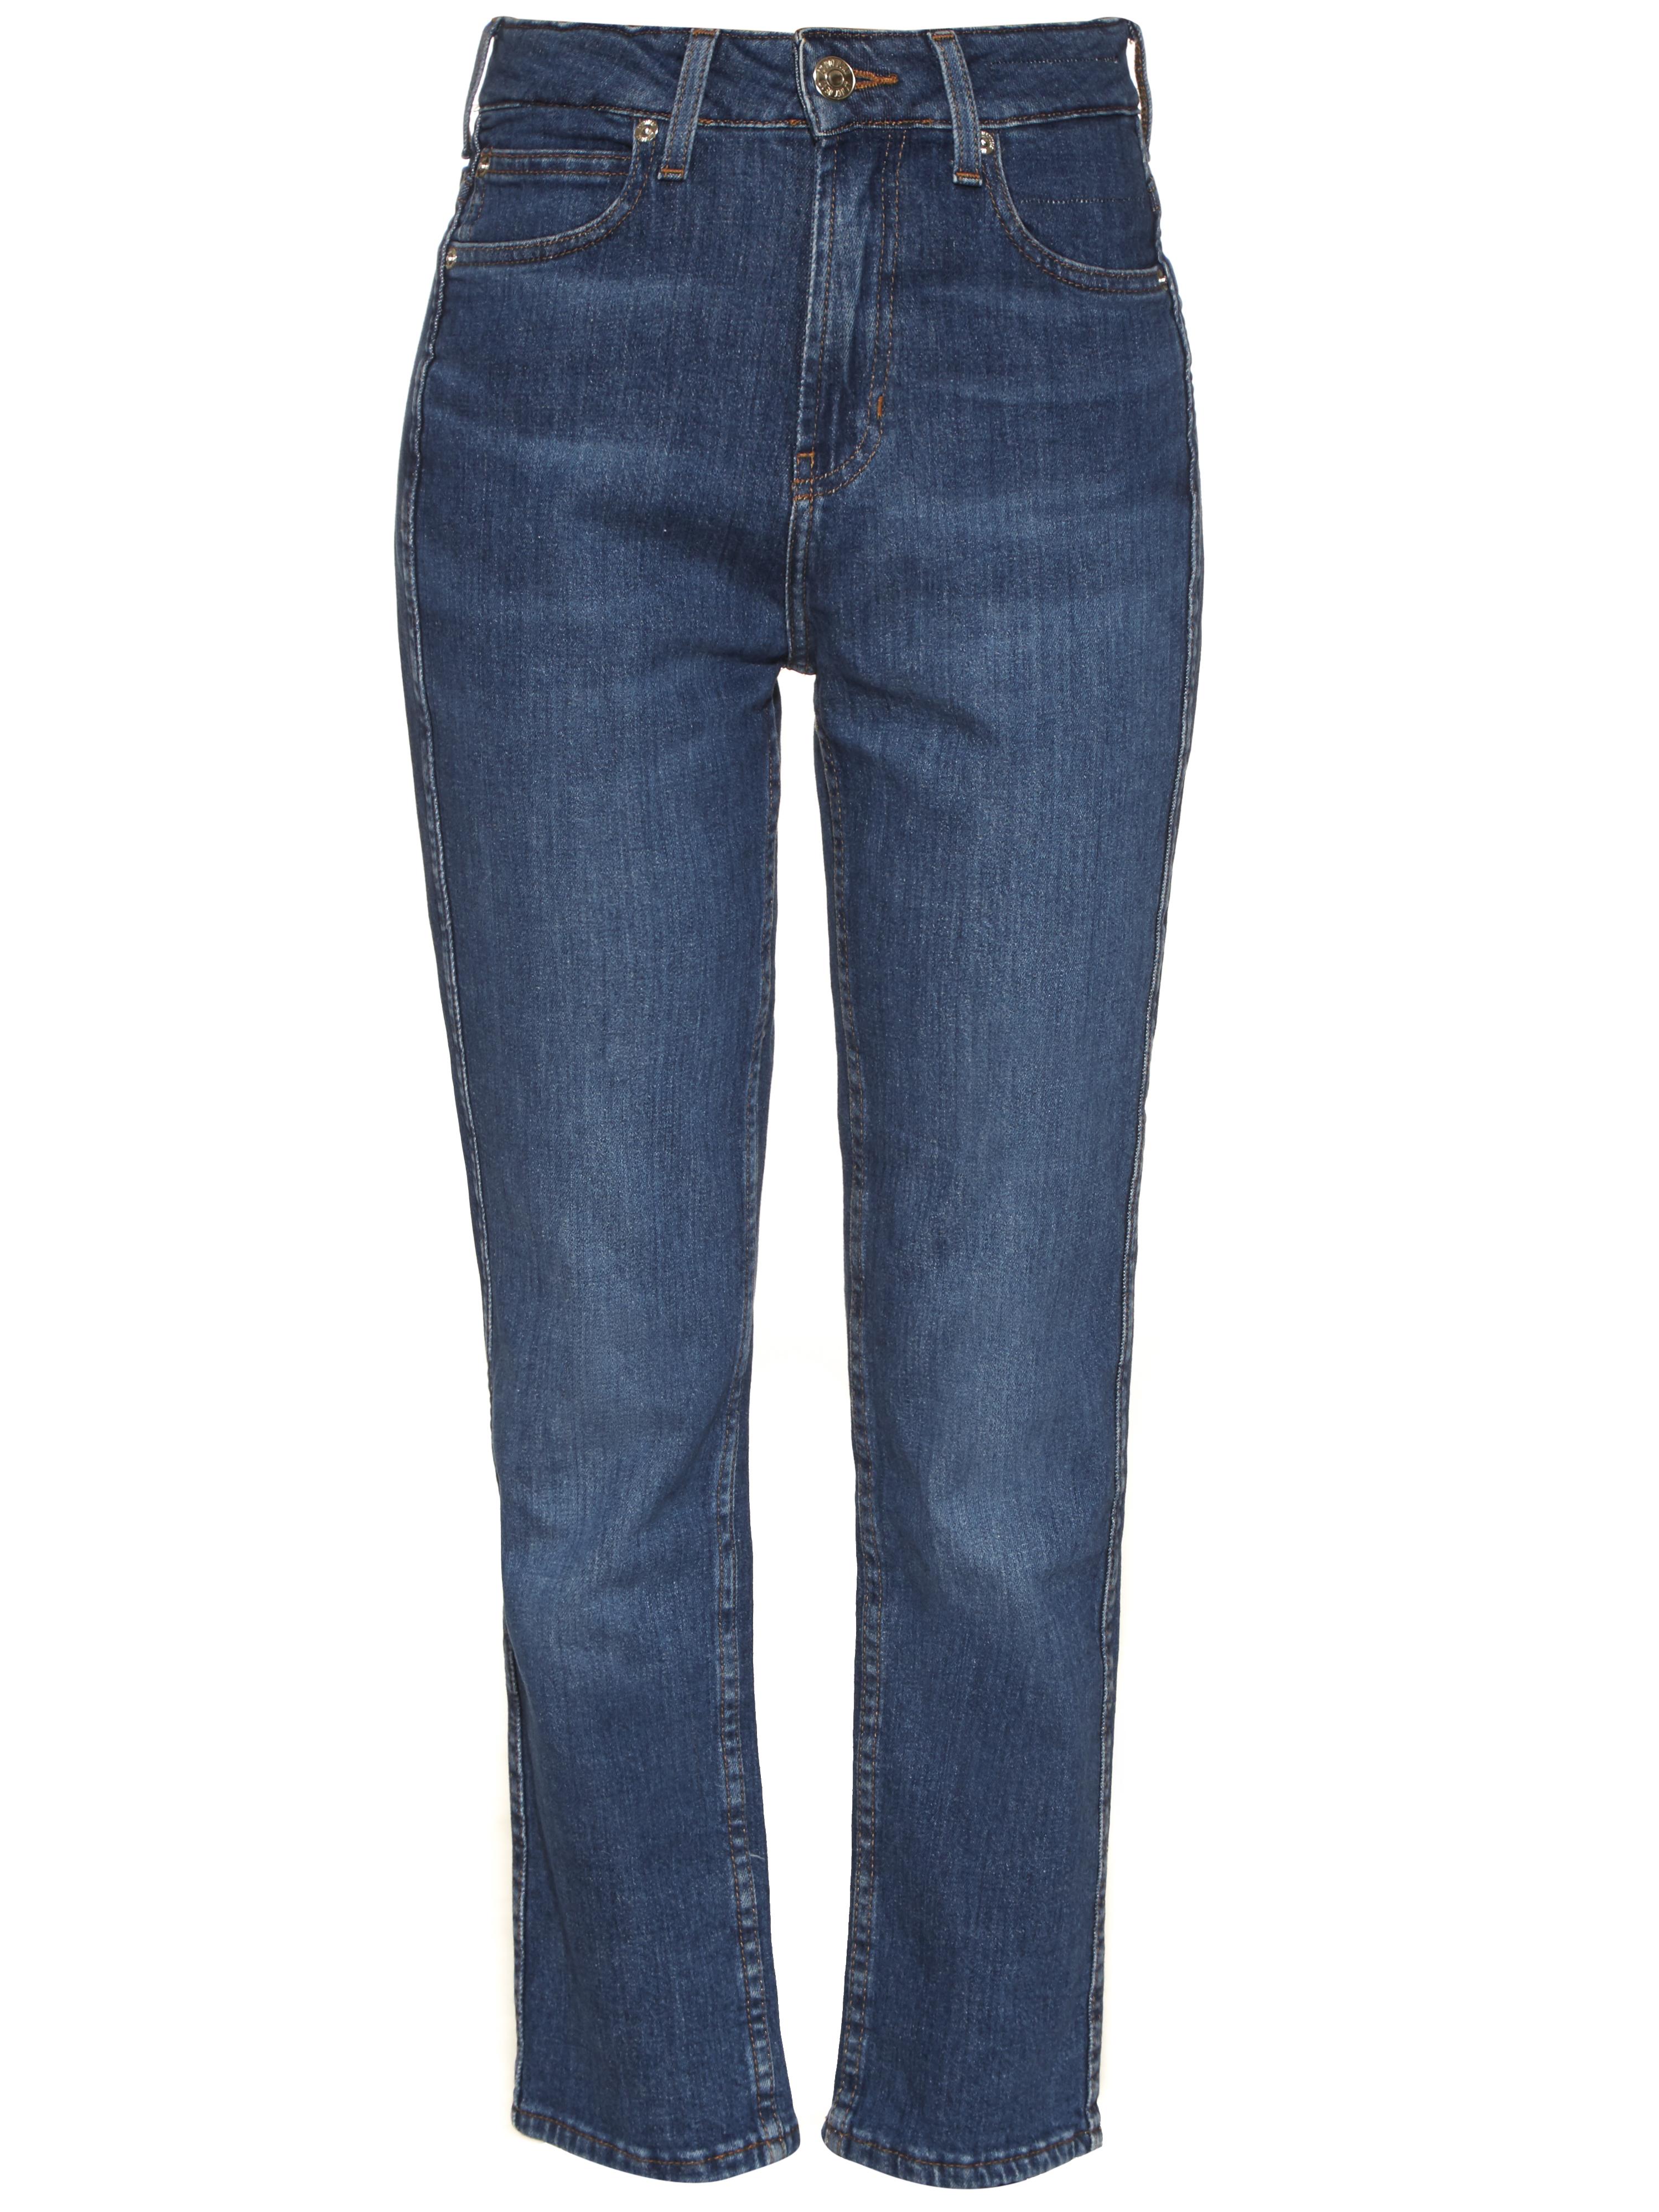 AY NOT DEAD Diffesa de la natura jeans algodón orgánico loqueva home